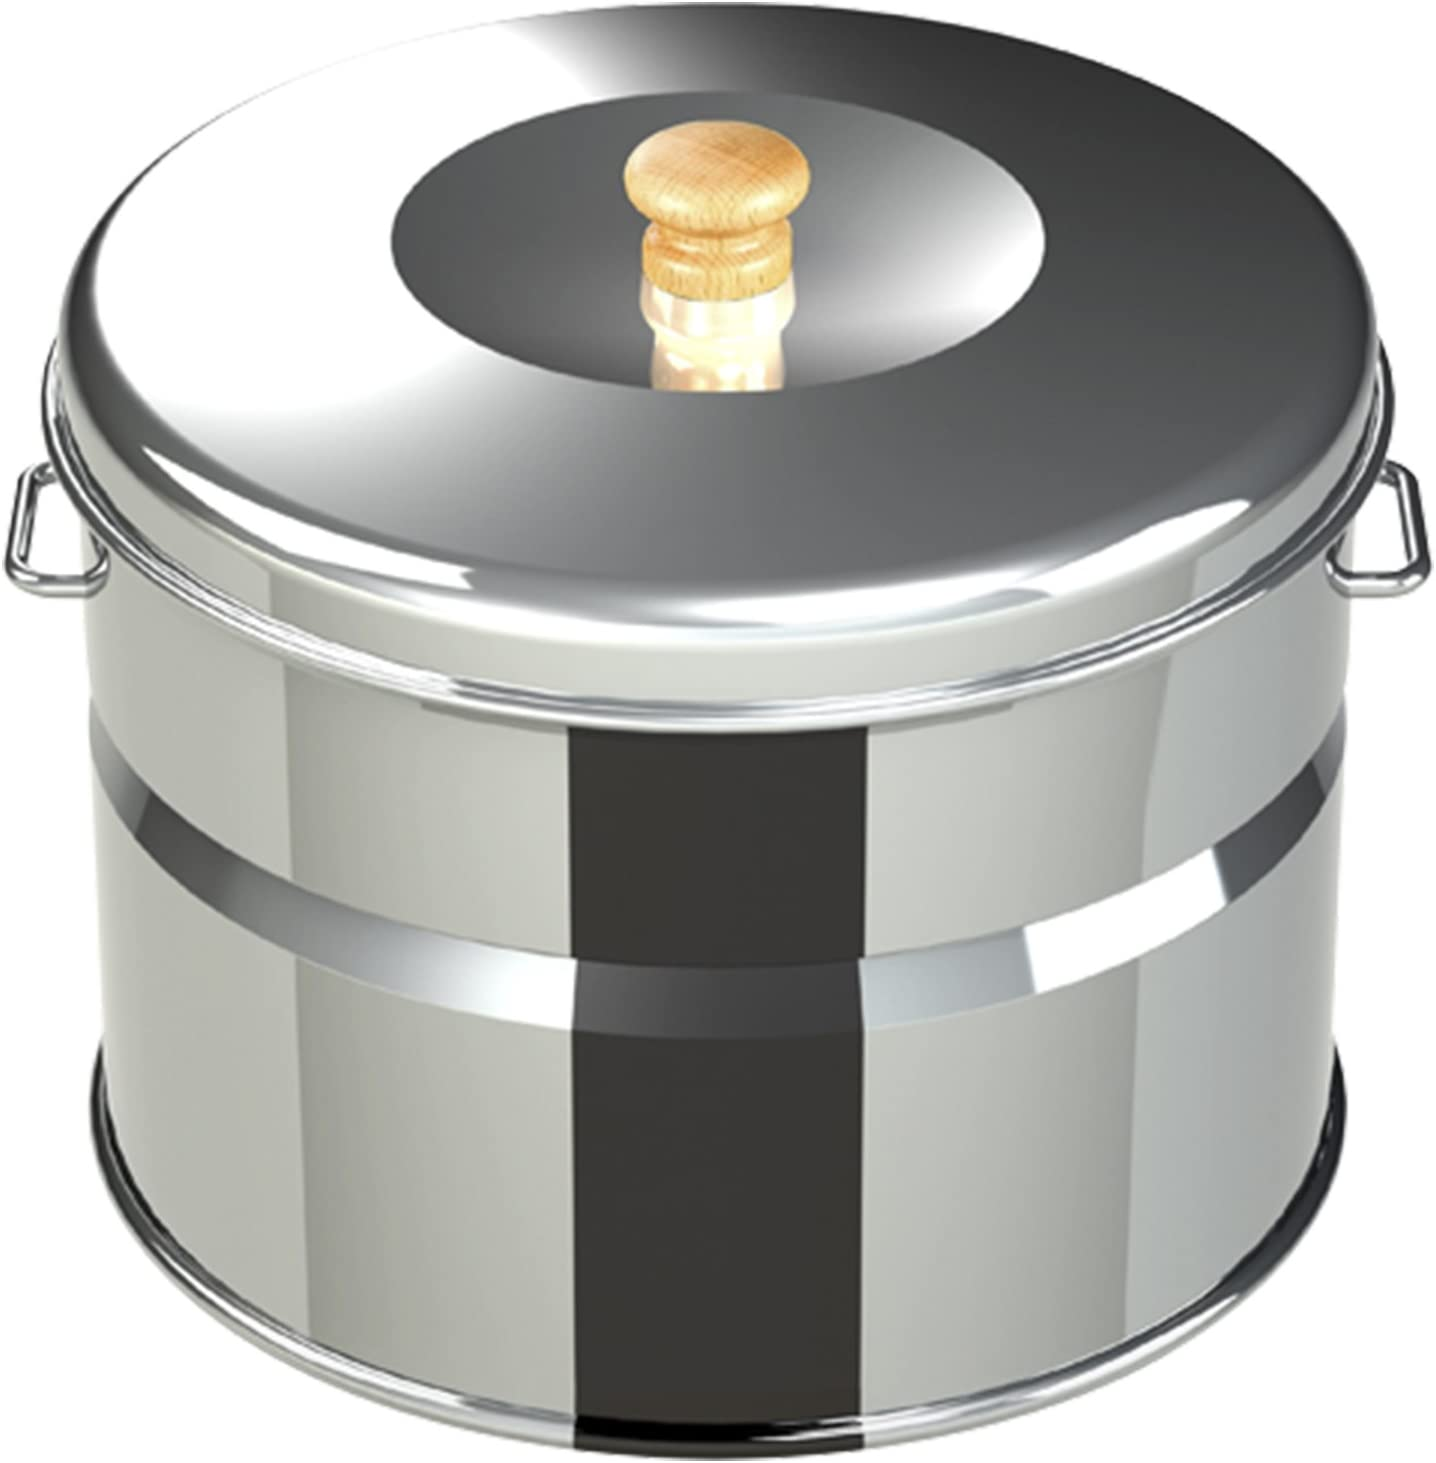 HONMA(ホンマ製作所)『キッチン スモークキュート (IH-240S)』